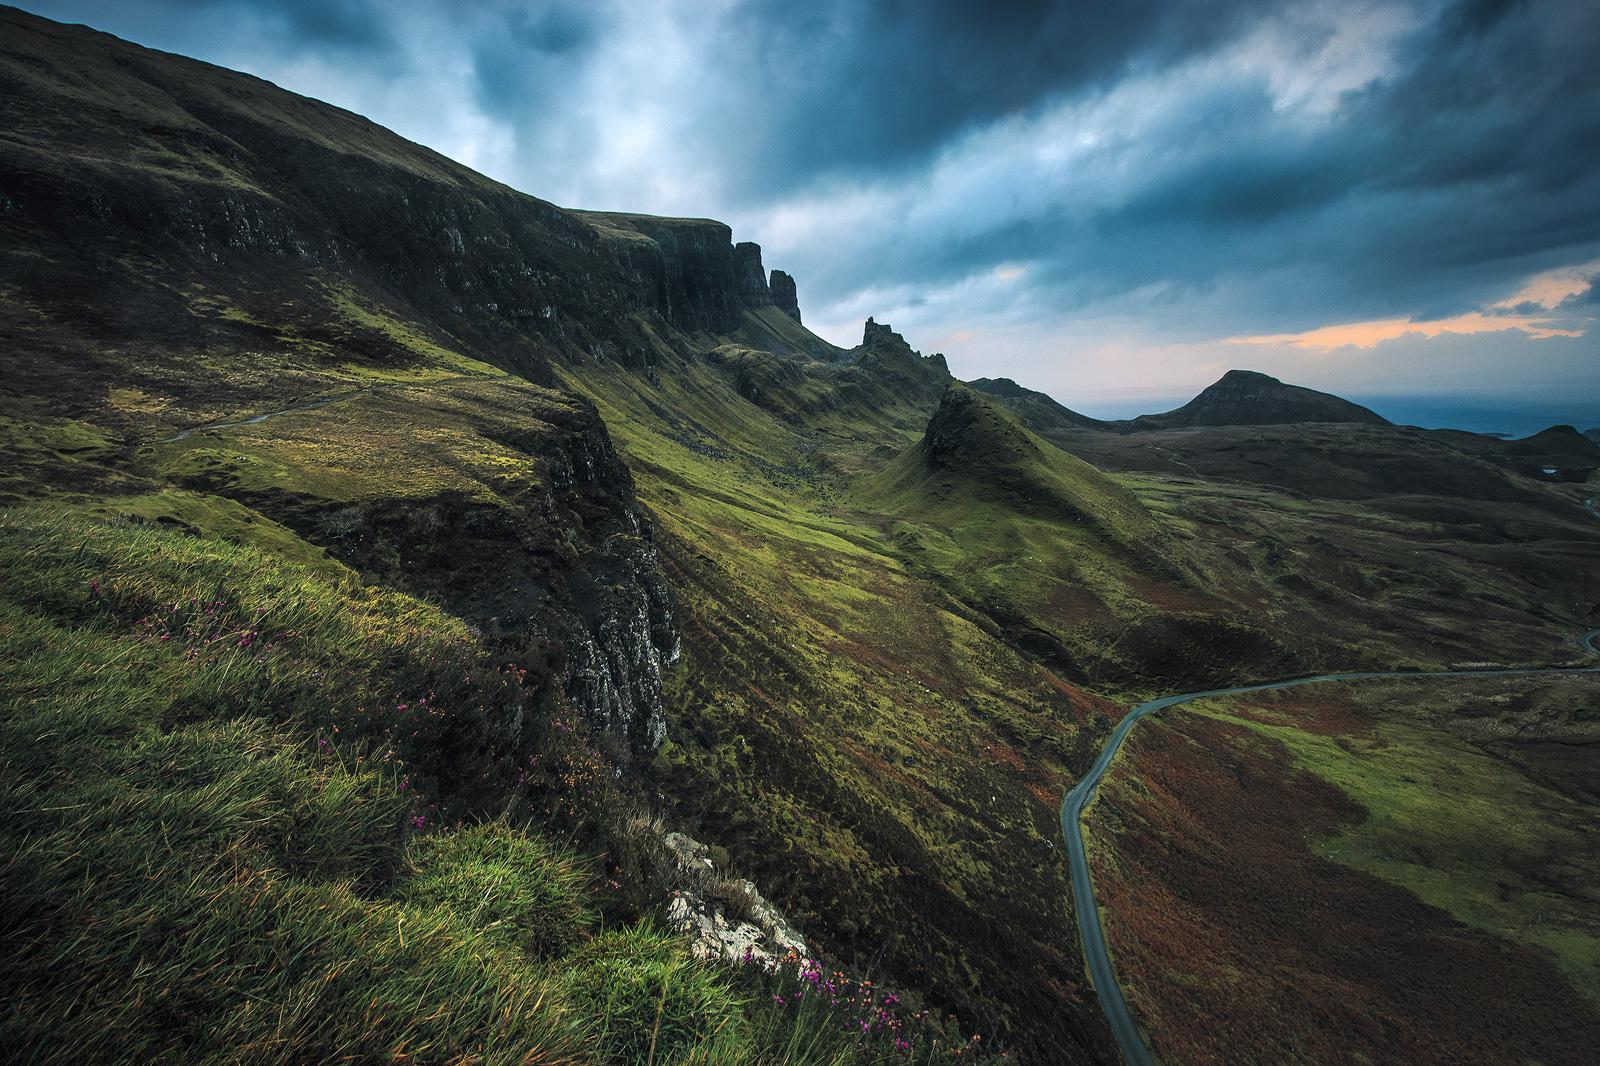 Fotospot Quiraing, Isle of Sky, Schottland,